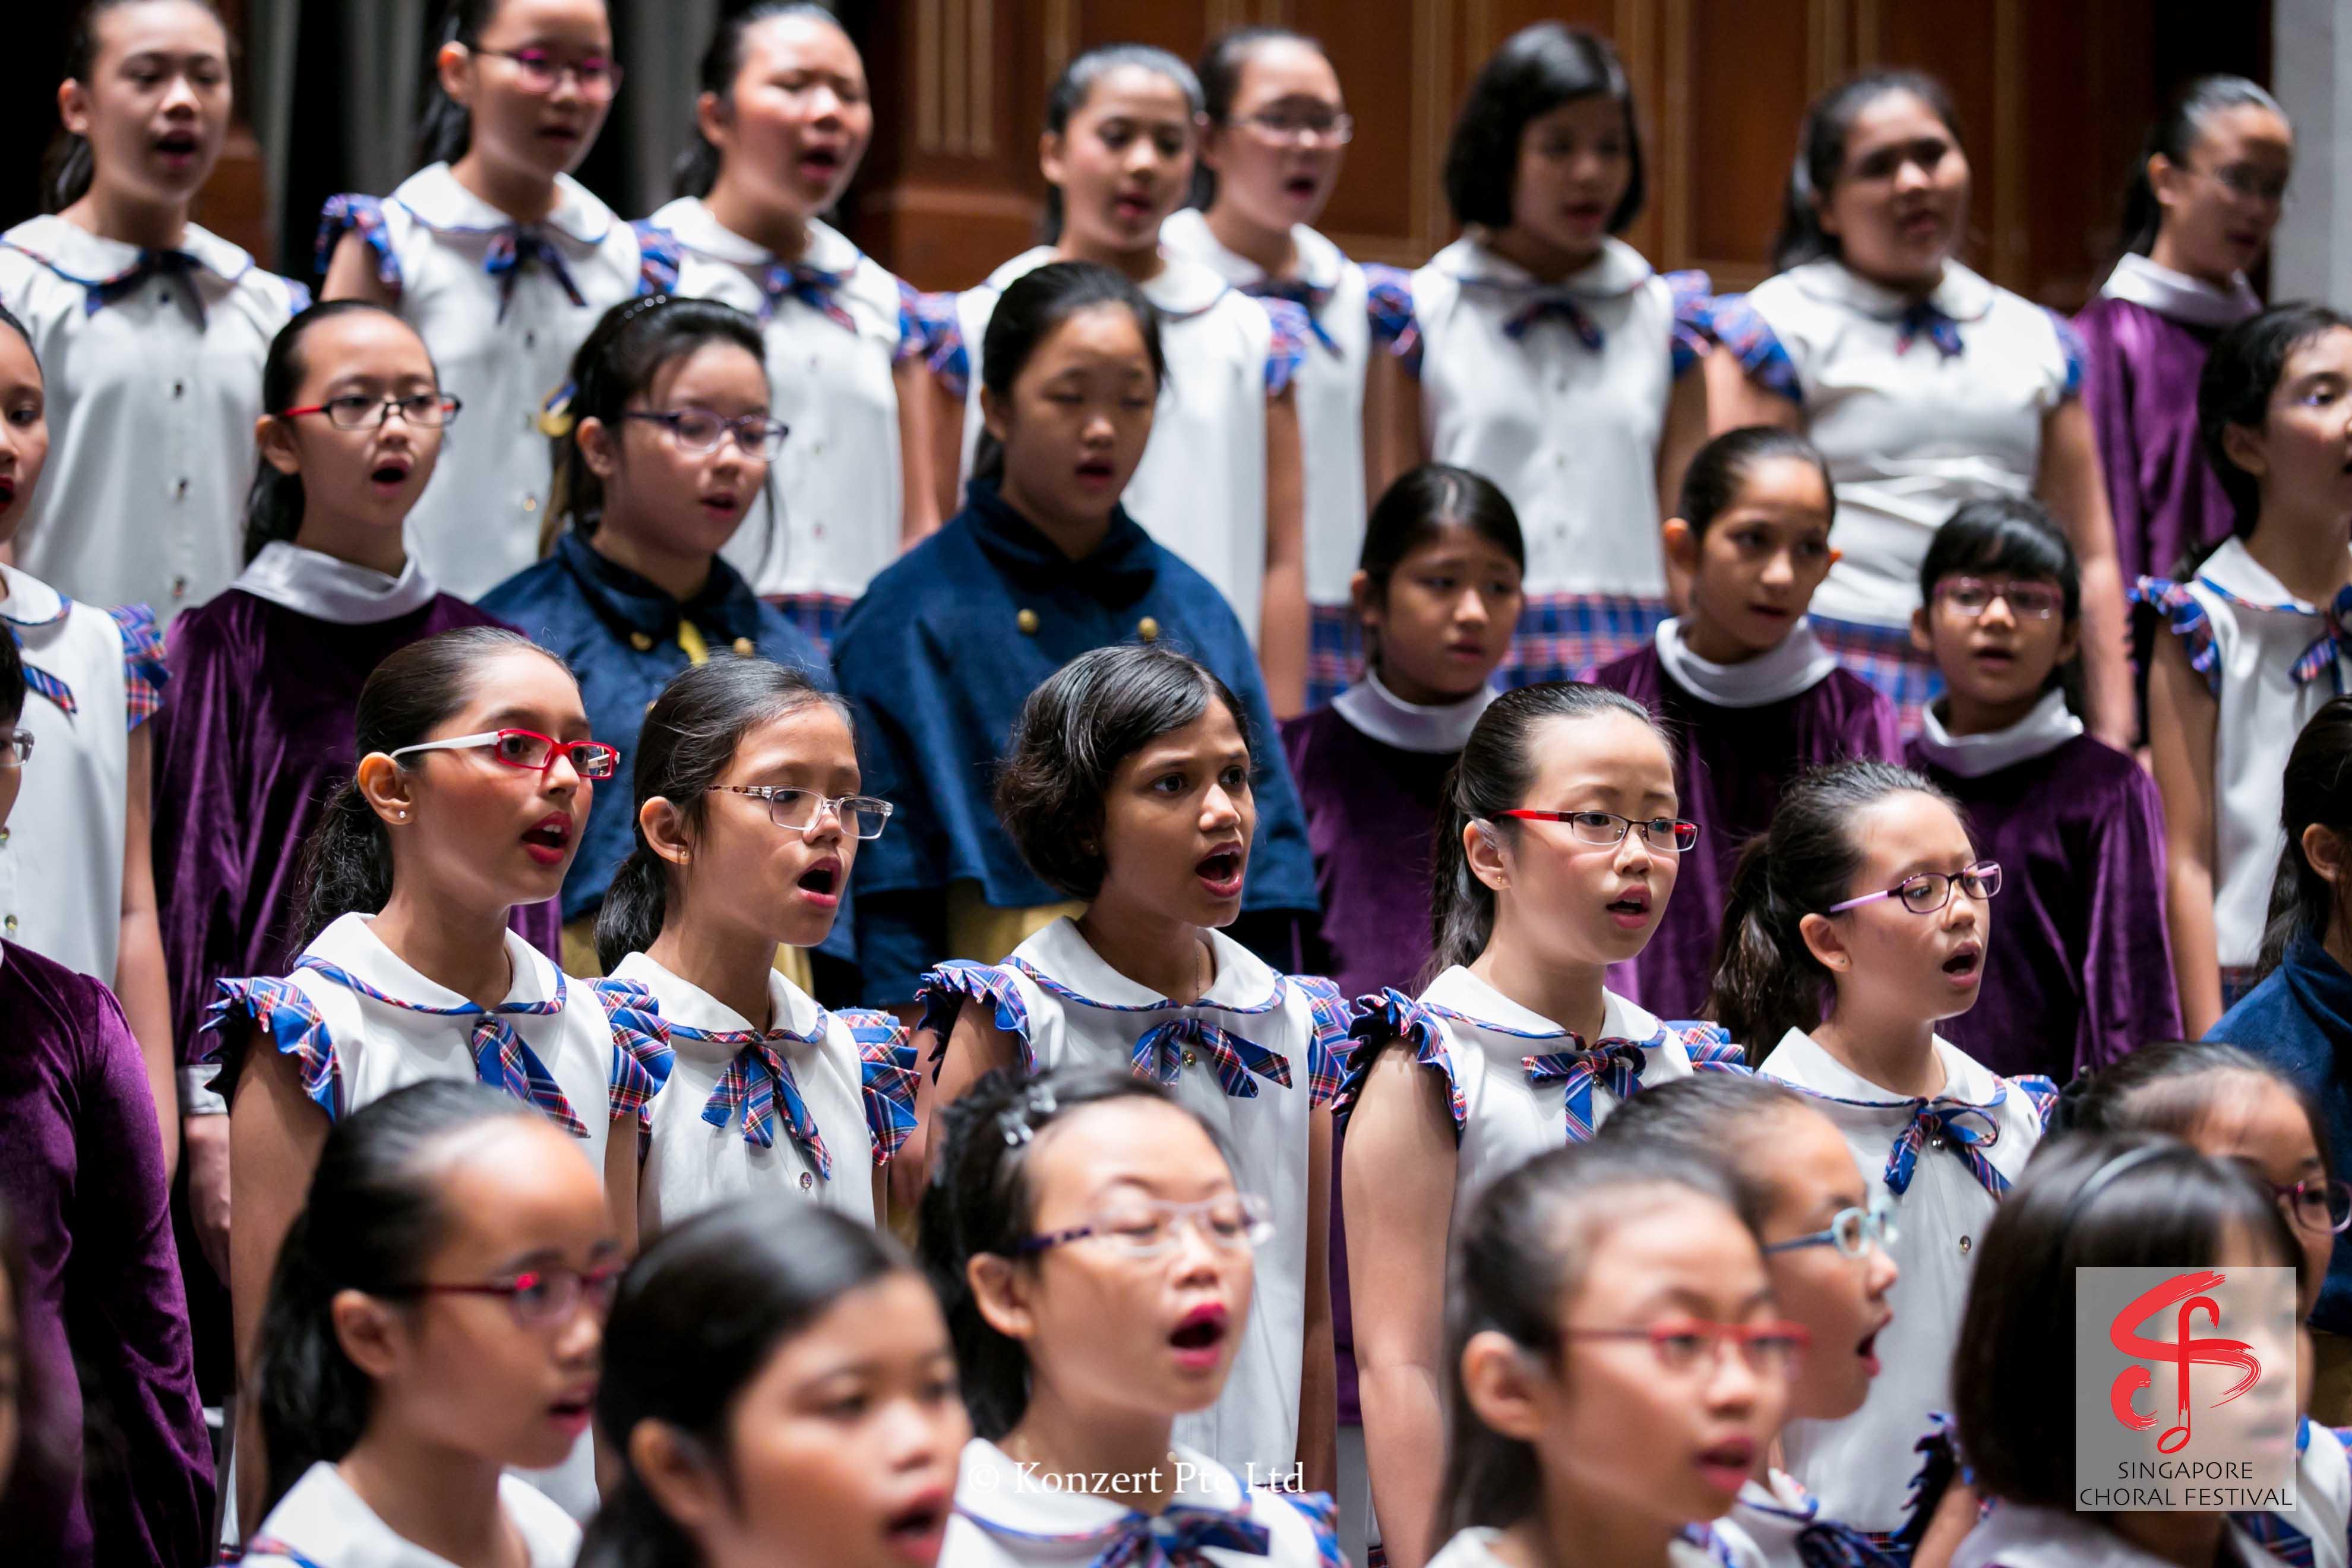 Singapore Choral Festival 8-8-15 (6).jpg